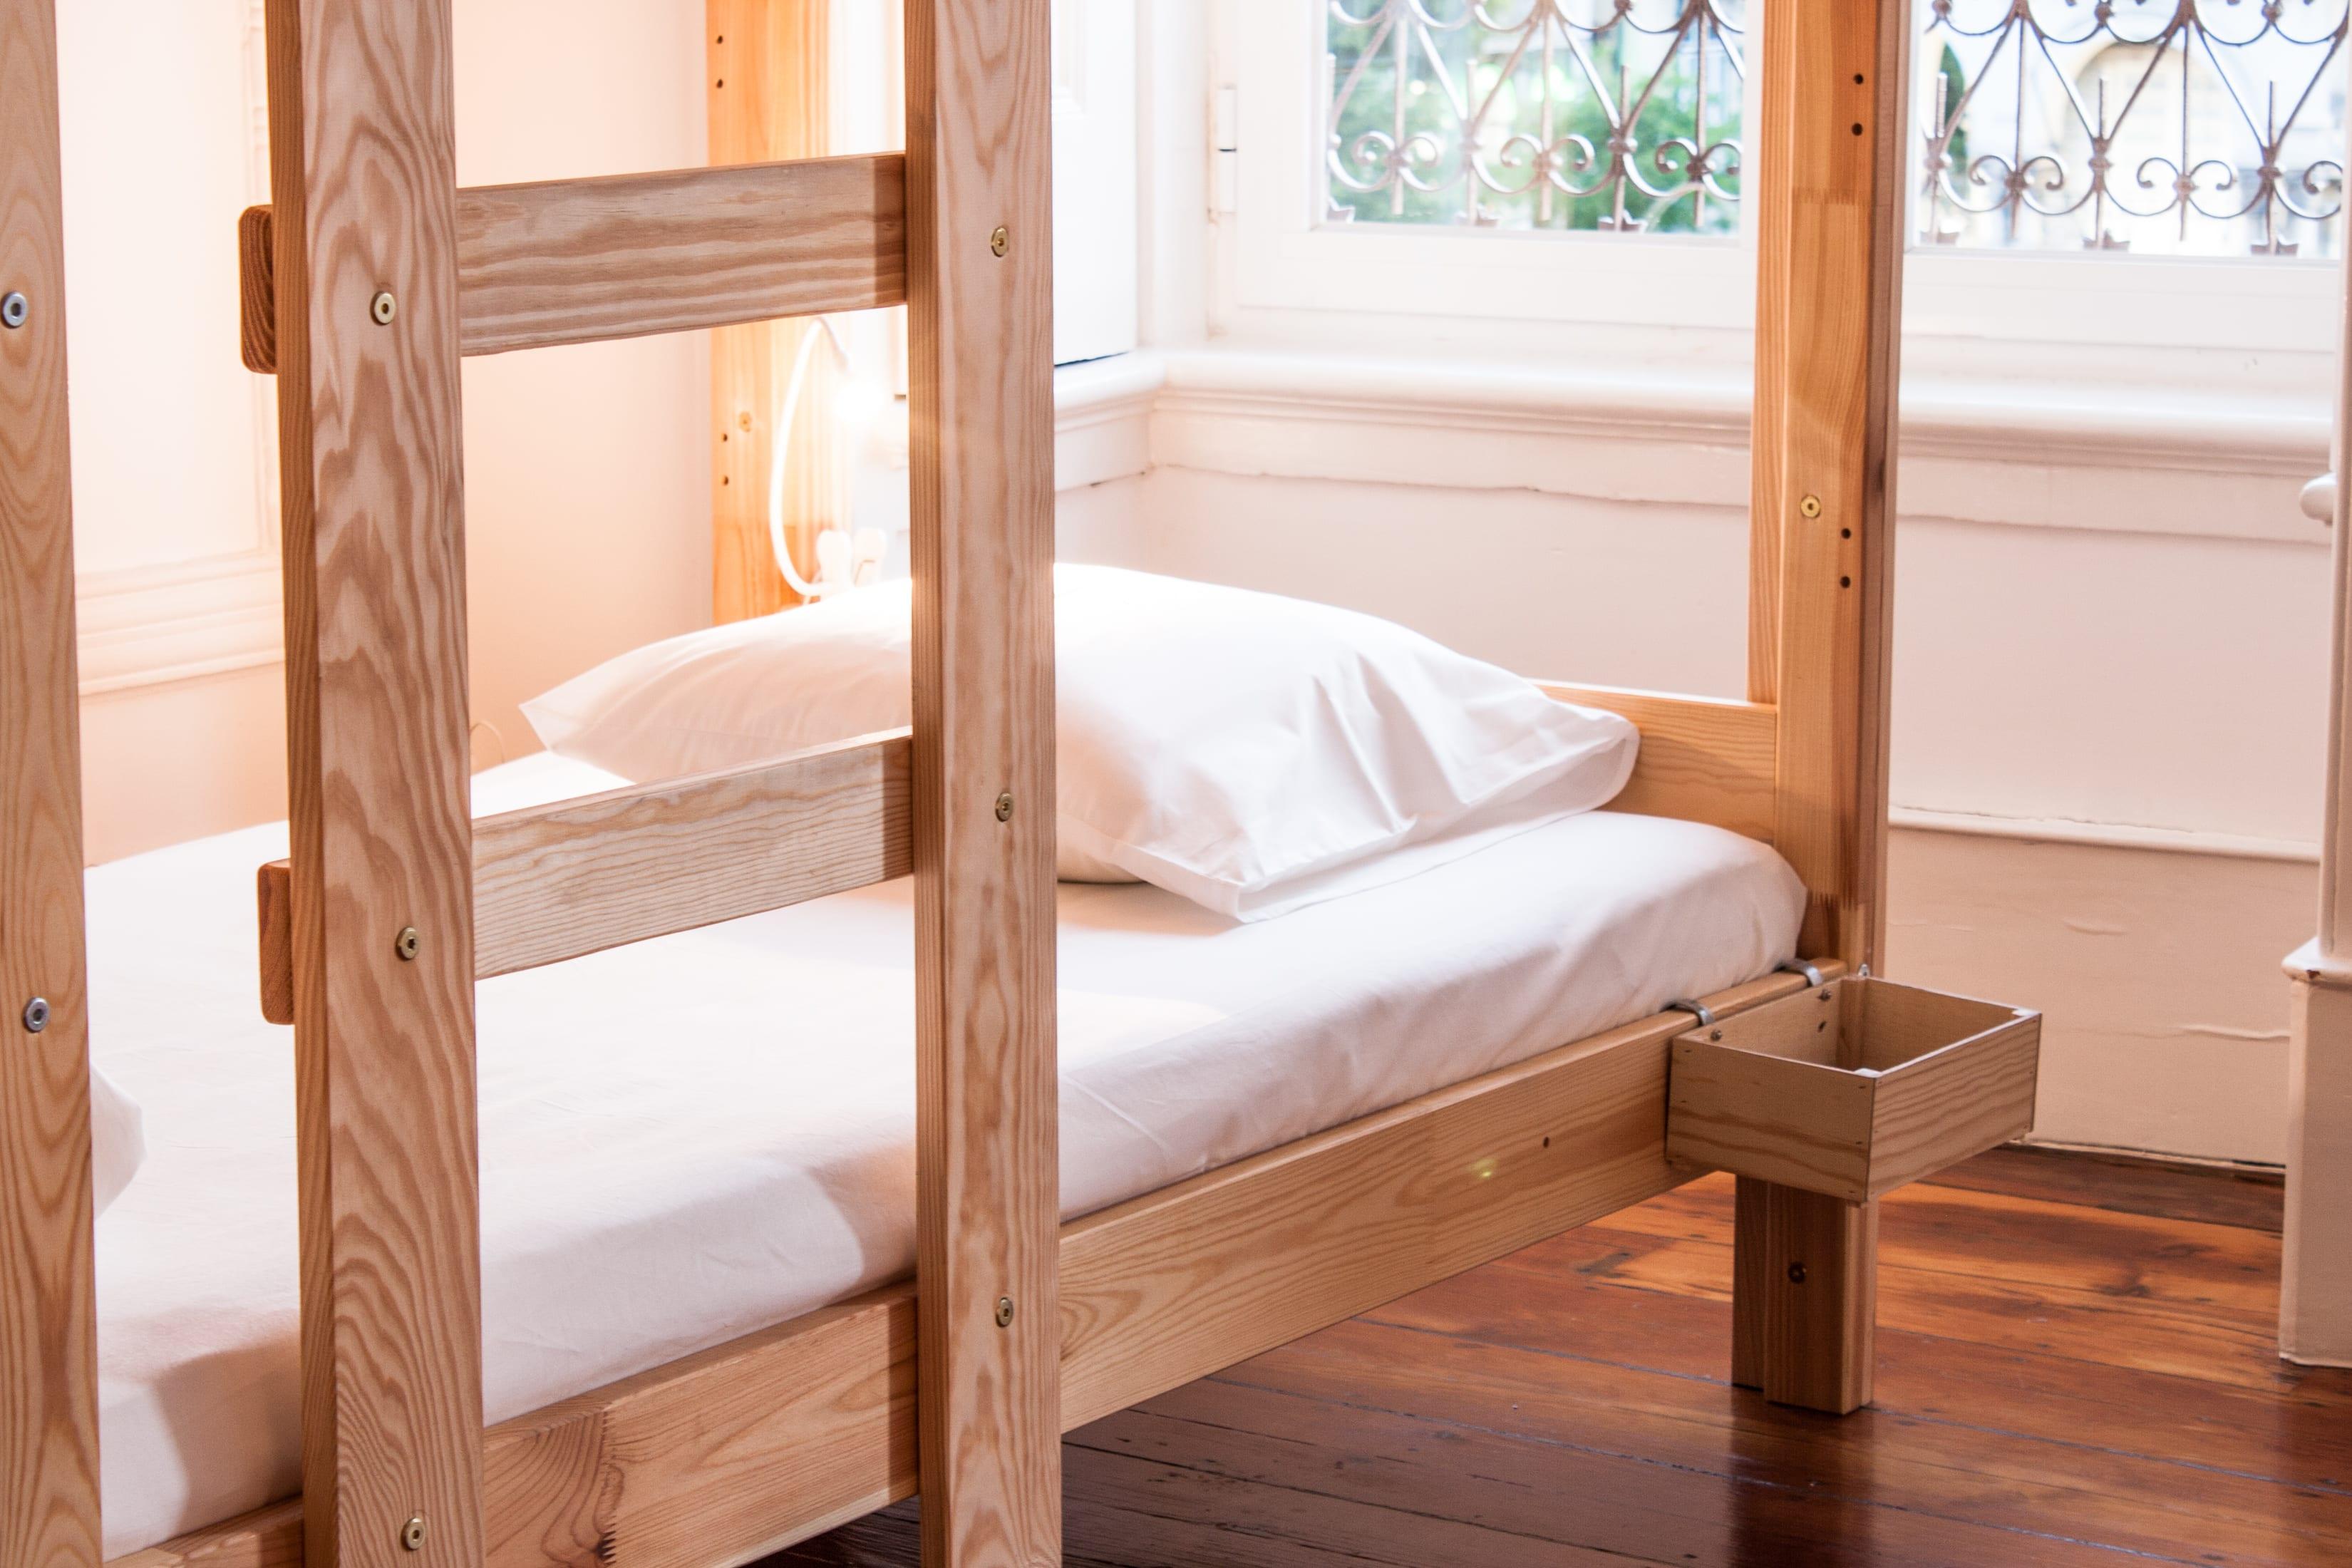 HOSTEL - Nest House Lisbon Hostel